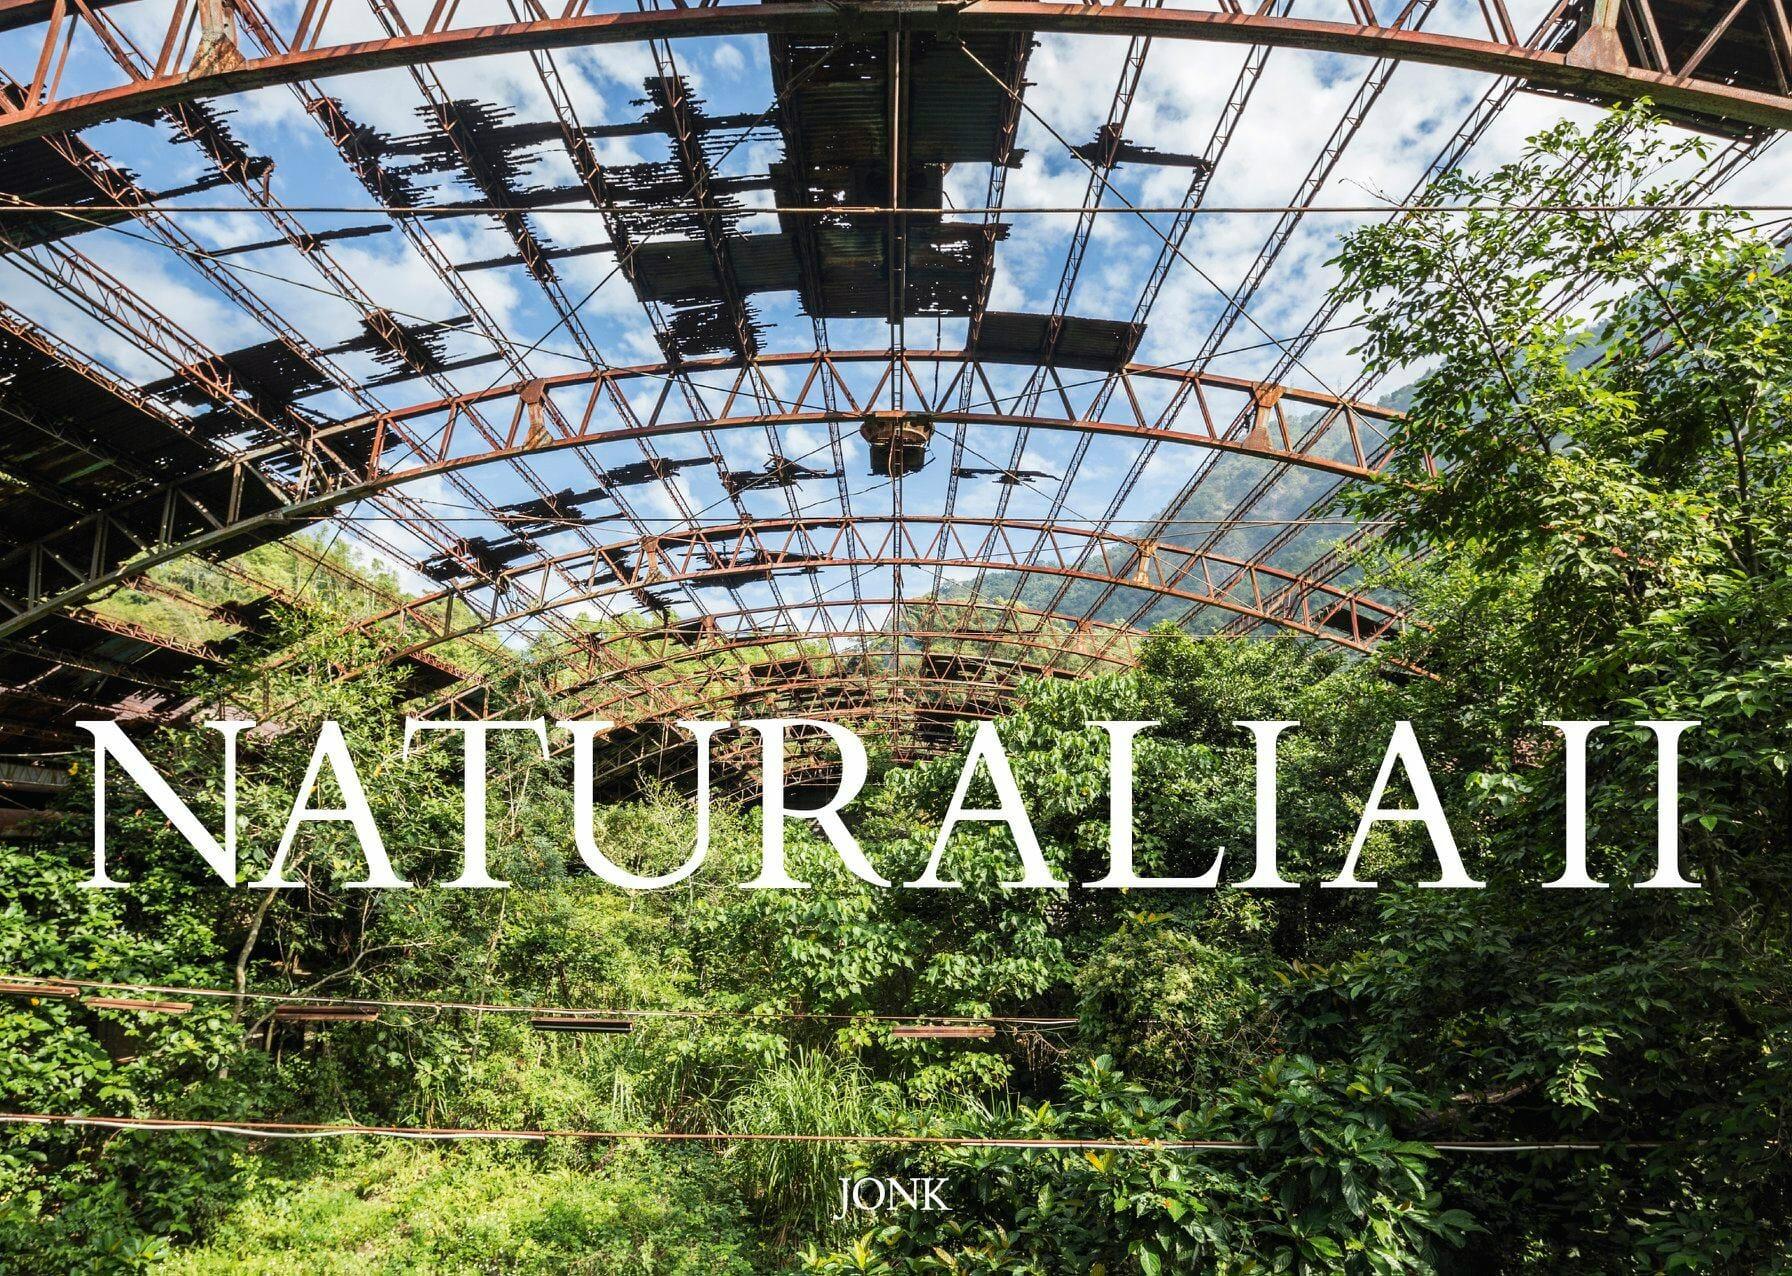 Naturalia II, le nouveau projet de Jonk 1